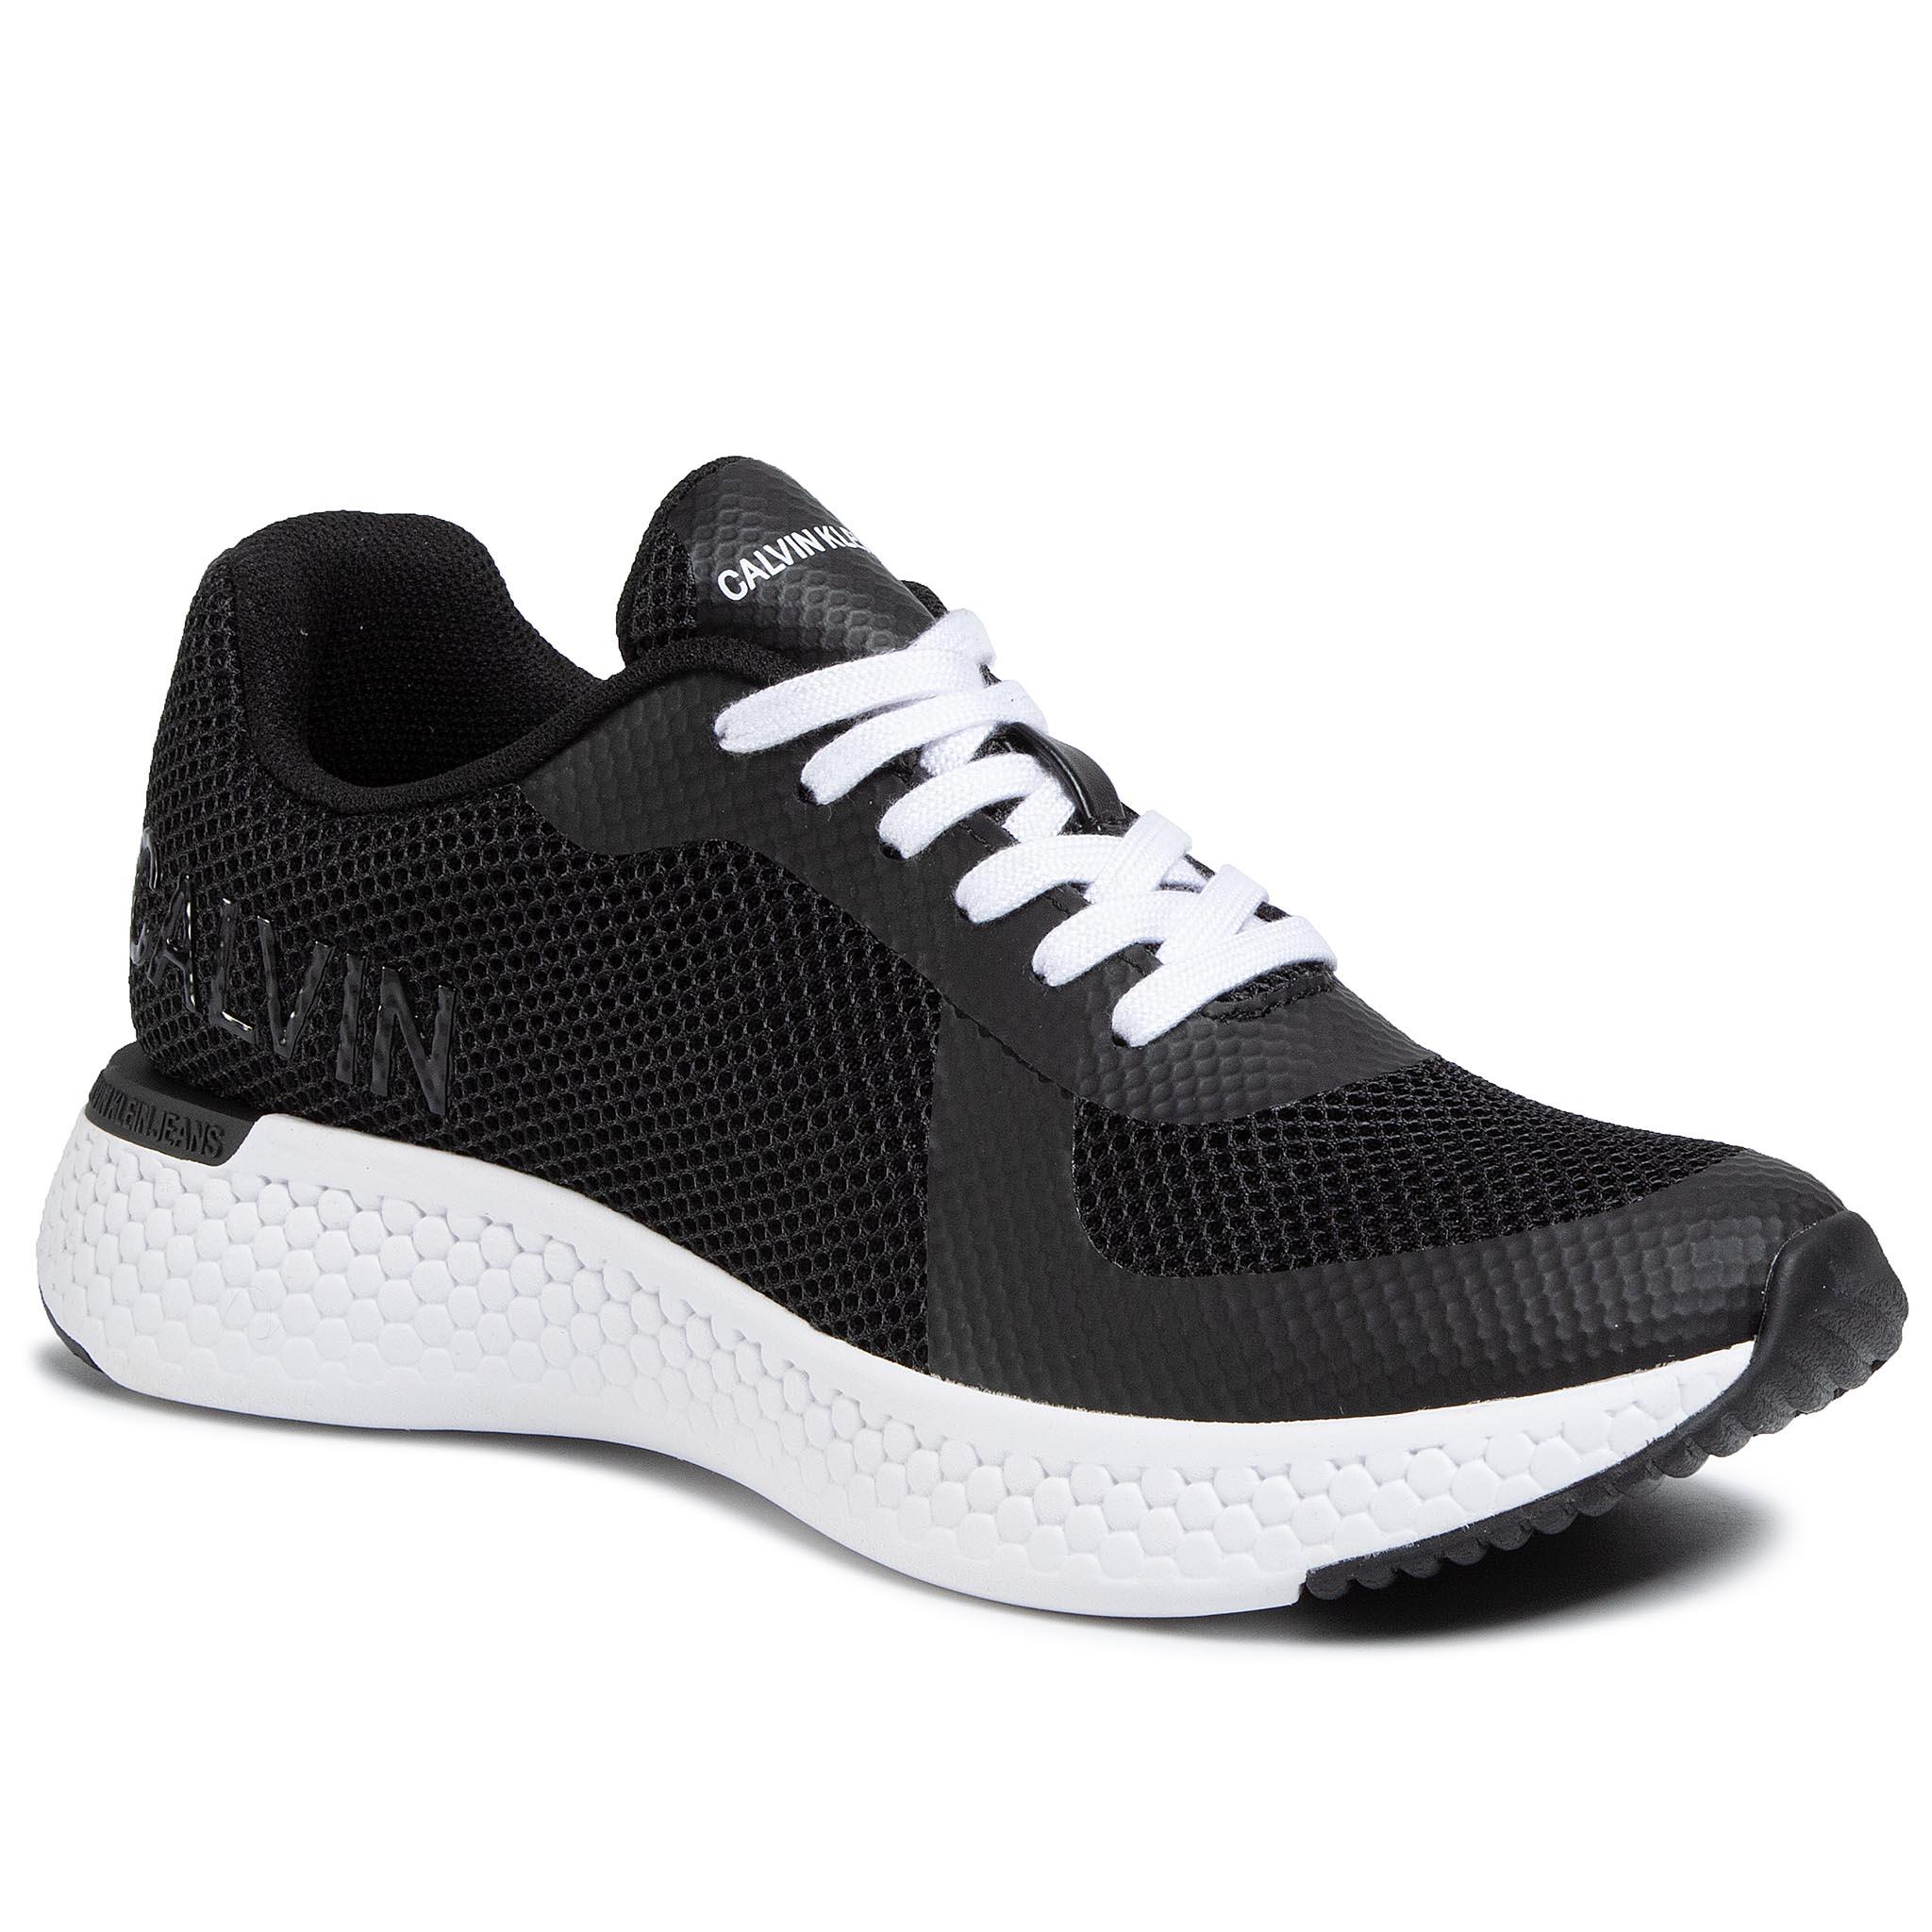 Image of Sneakers CALVIN KLEIN JEANS - Amos S0584 Black/Black